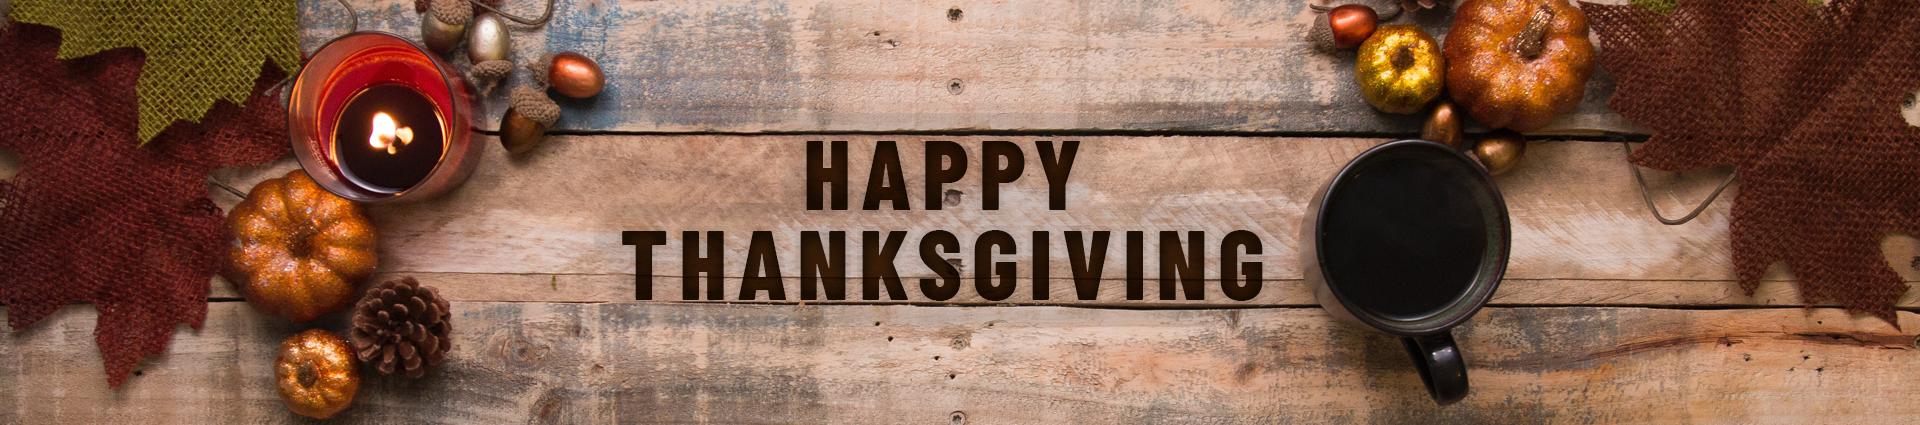 thanksgiving-banner